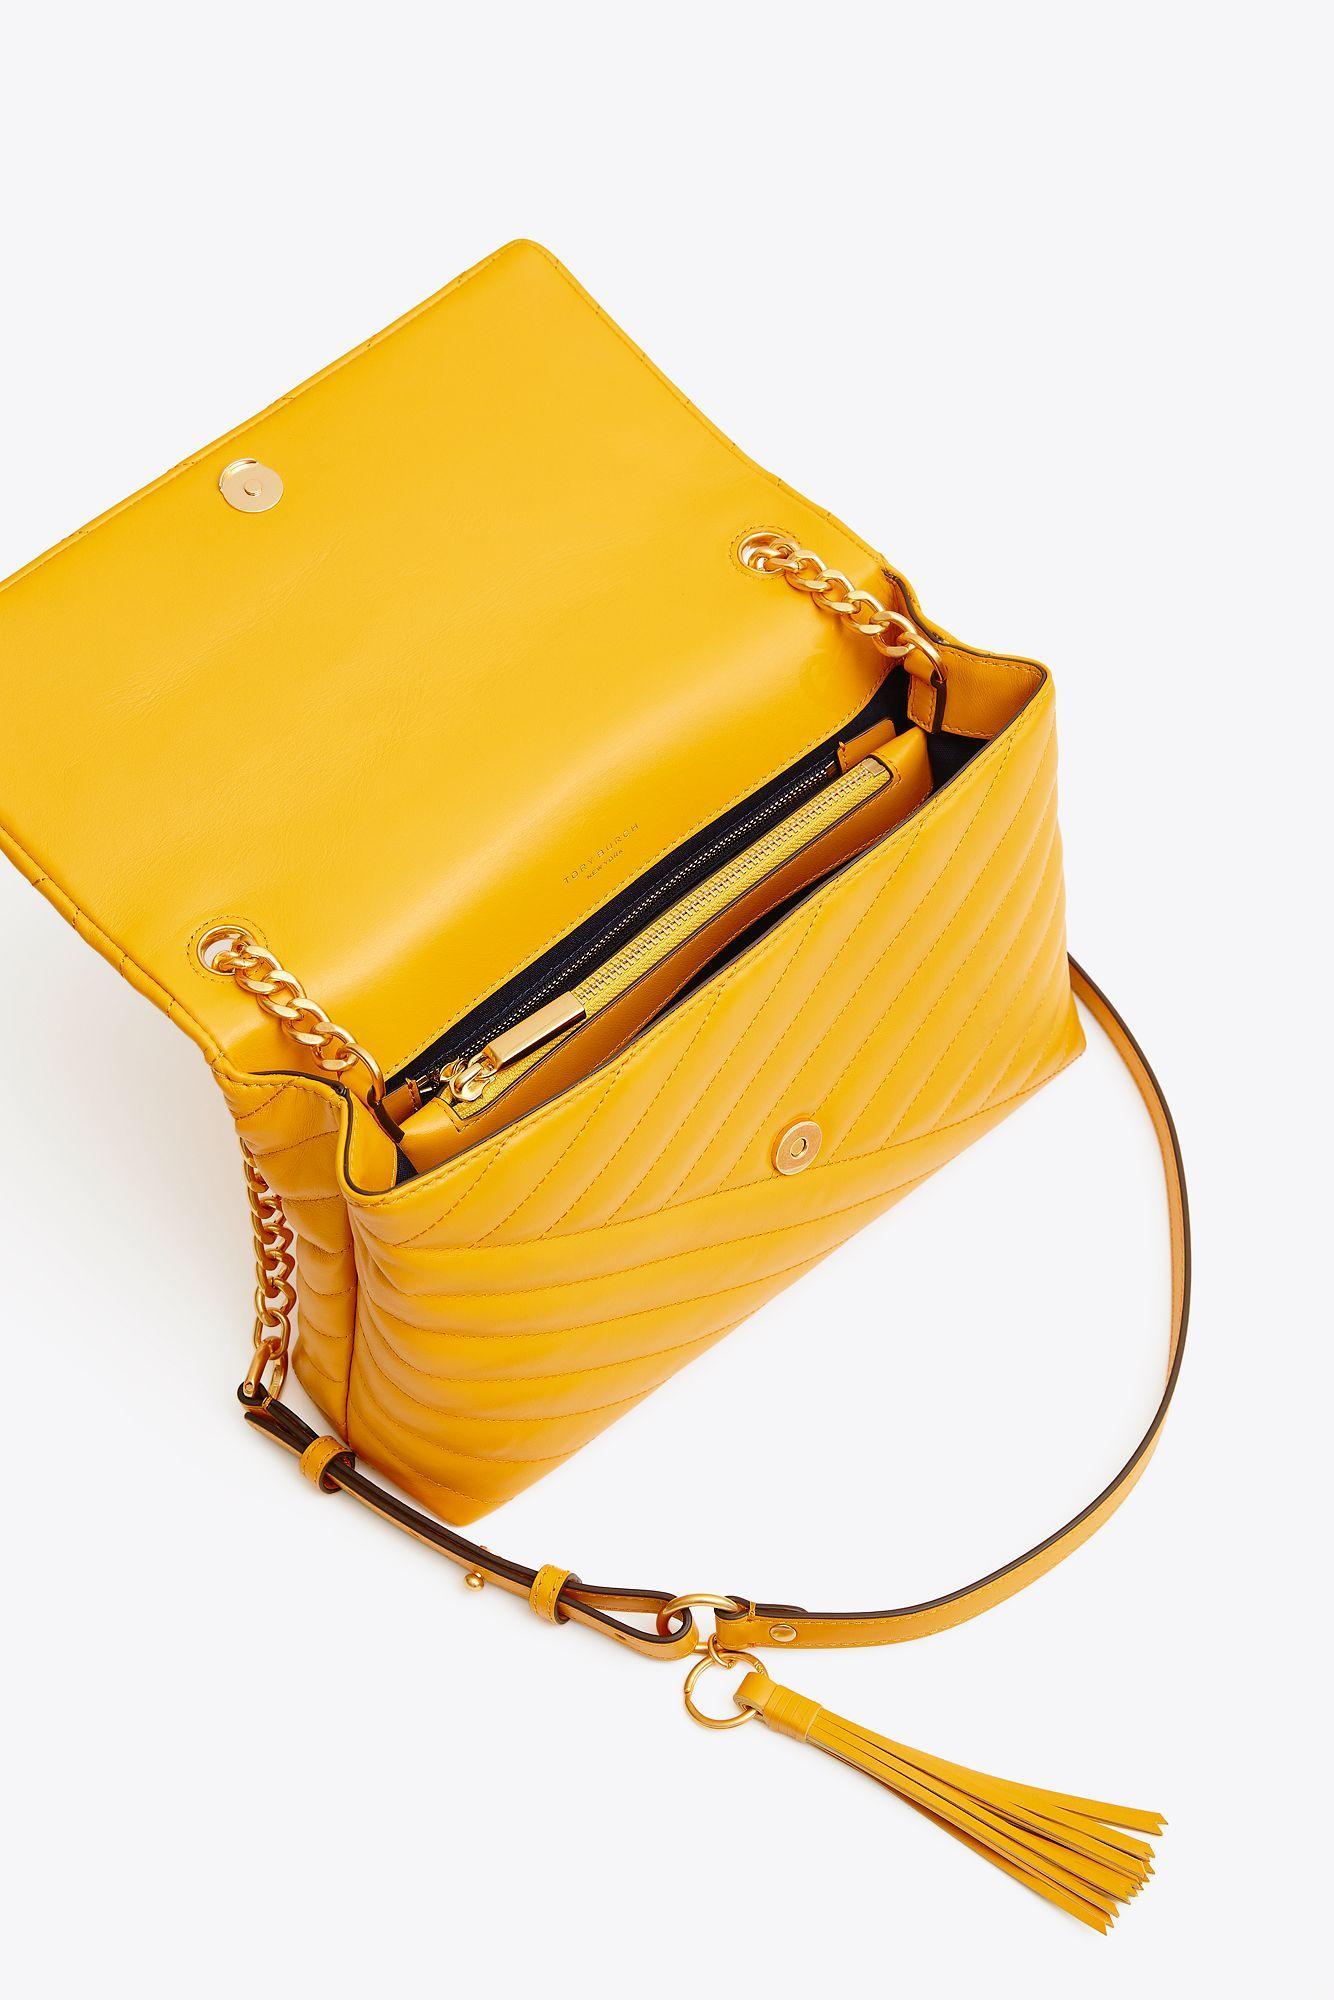 dbed74a0be30 Lyst - Tory Burch Kira Chevron Flap Shoulder Bag in Yellow